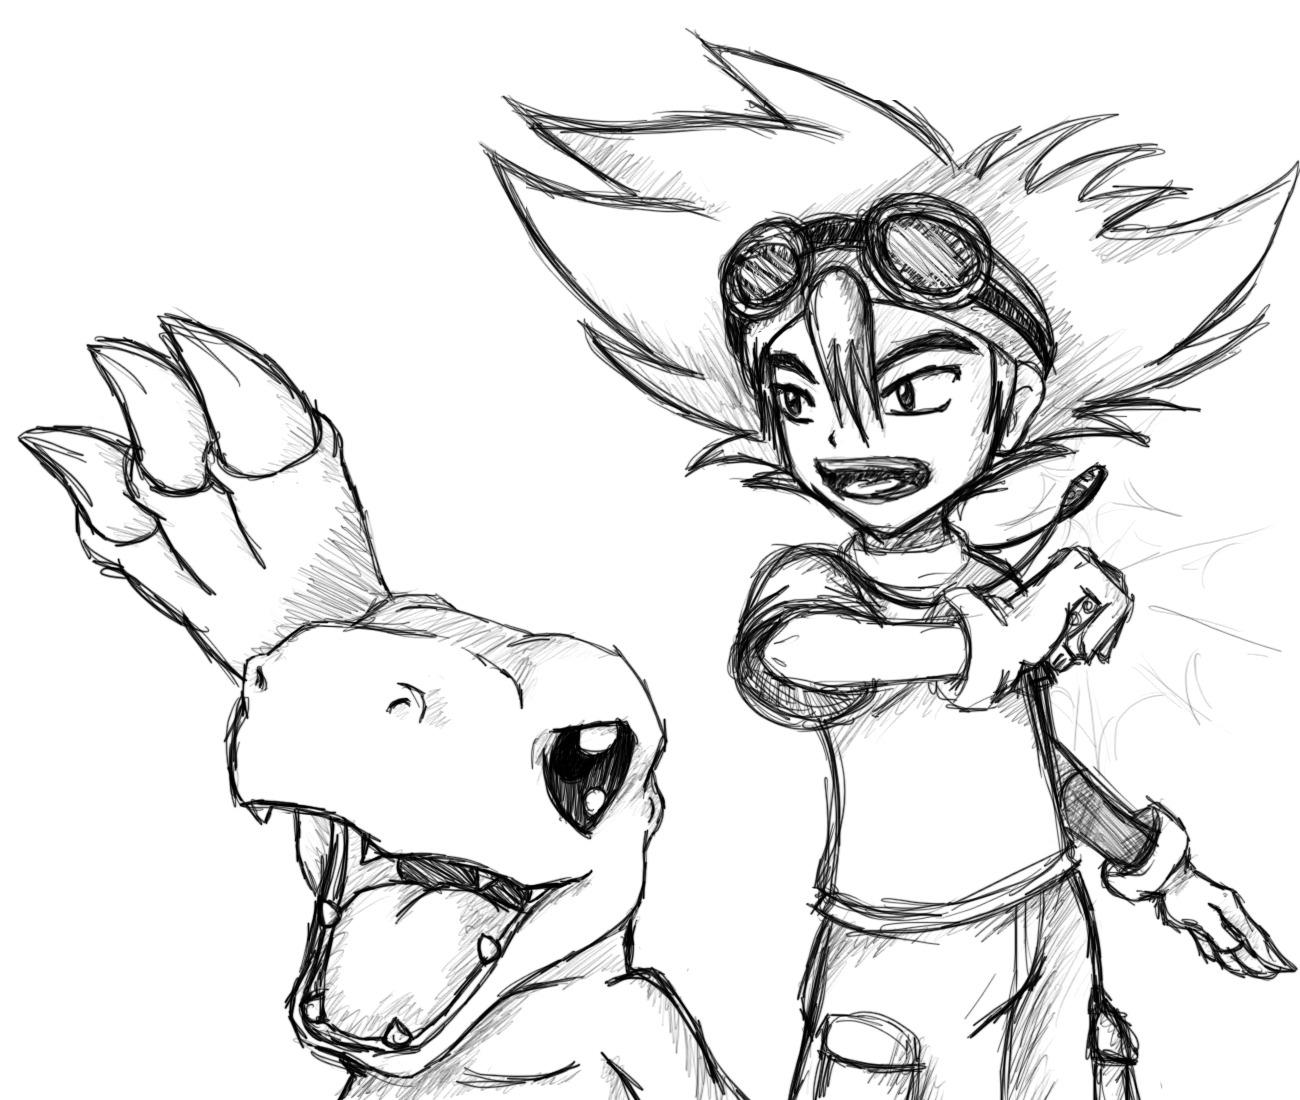 Tai and Agumon by Emeraldwolf